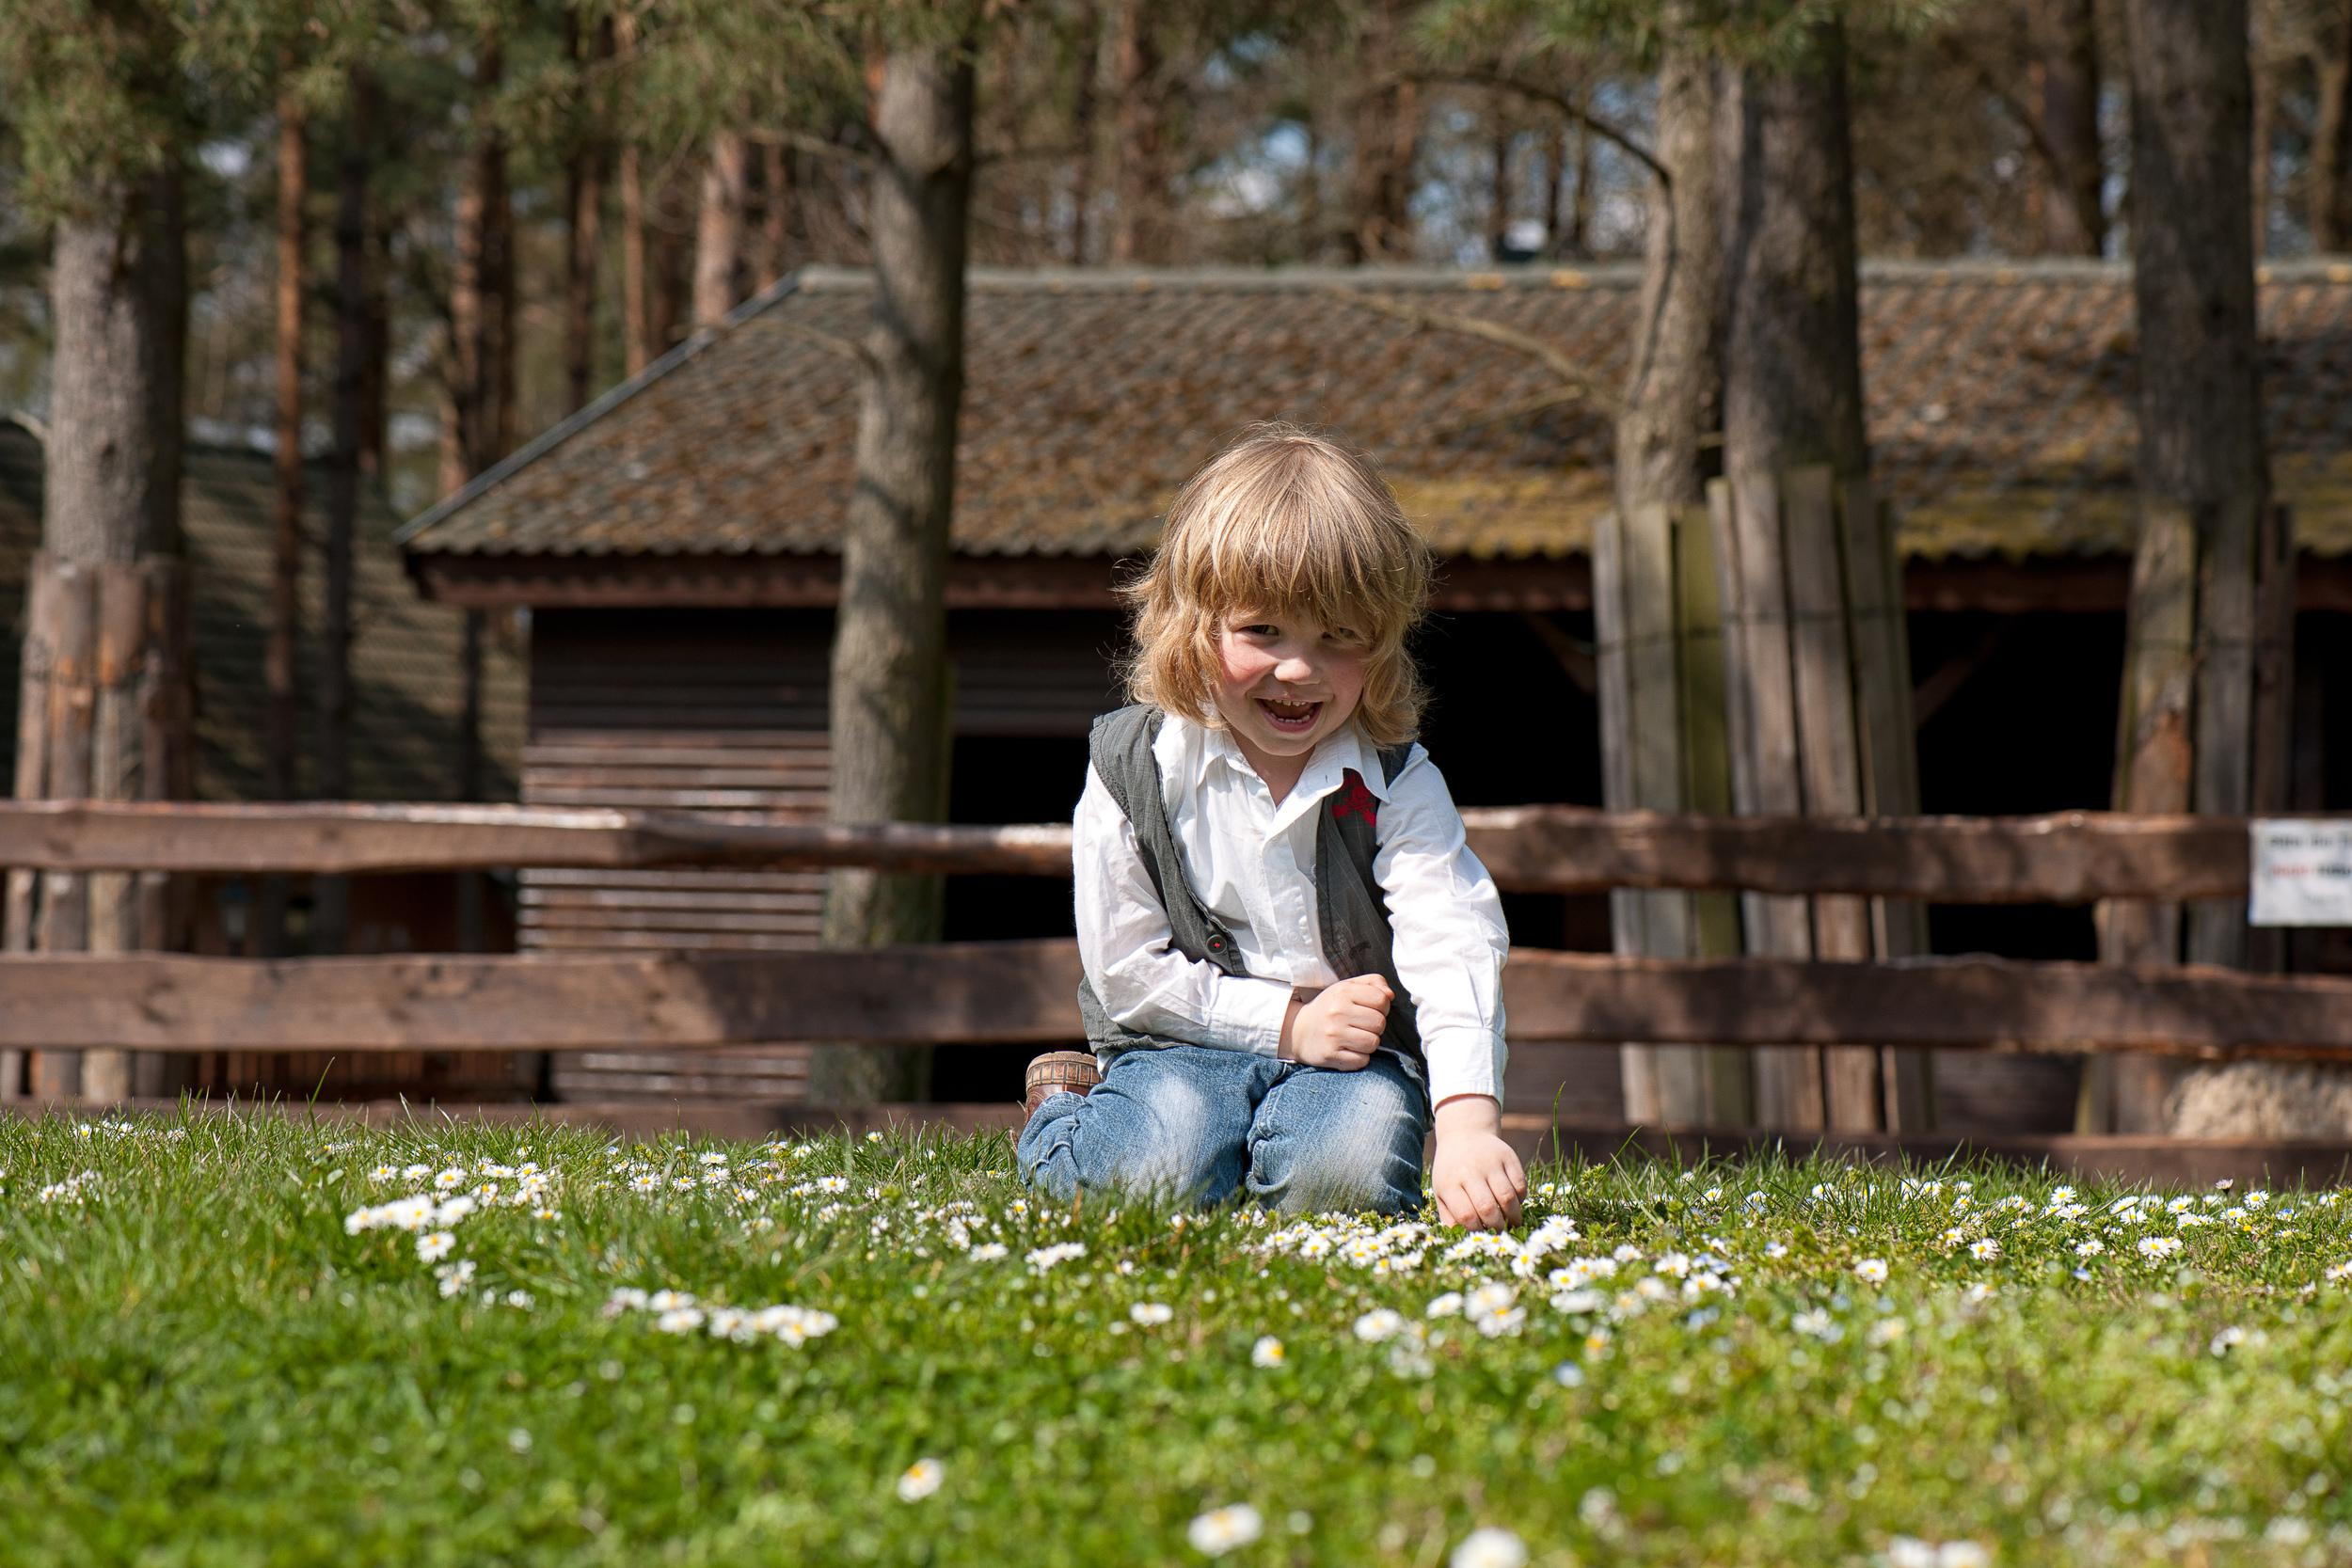 Van_der_Valk_Naturresort_Drewitzer_Zee_20120420_0528-Edit.jpg